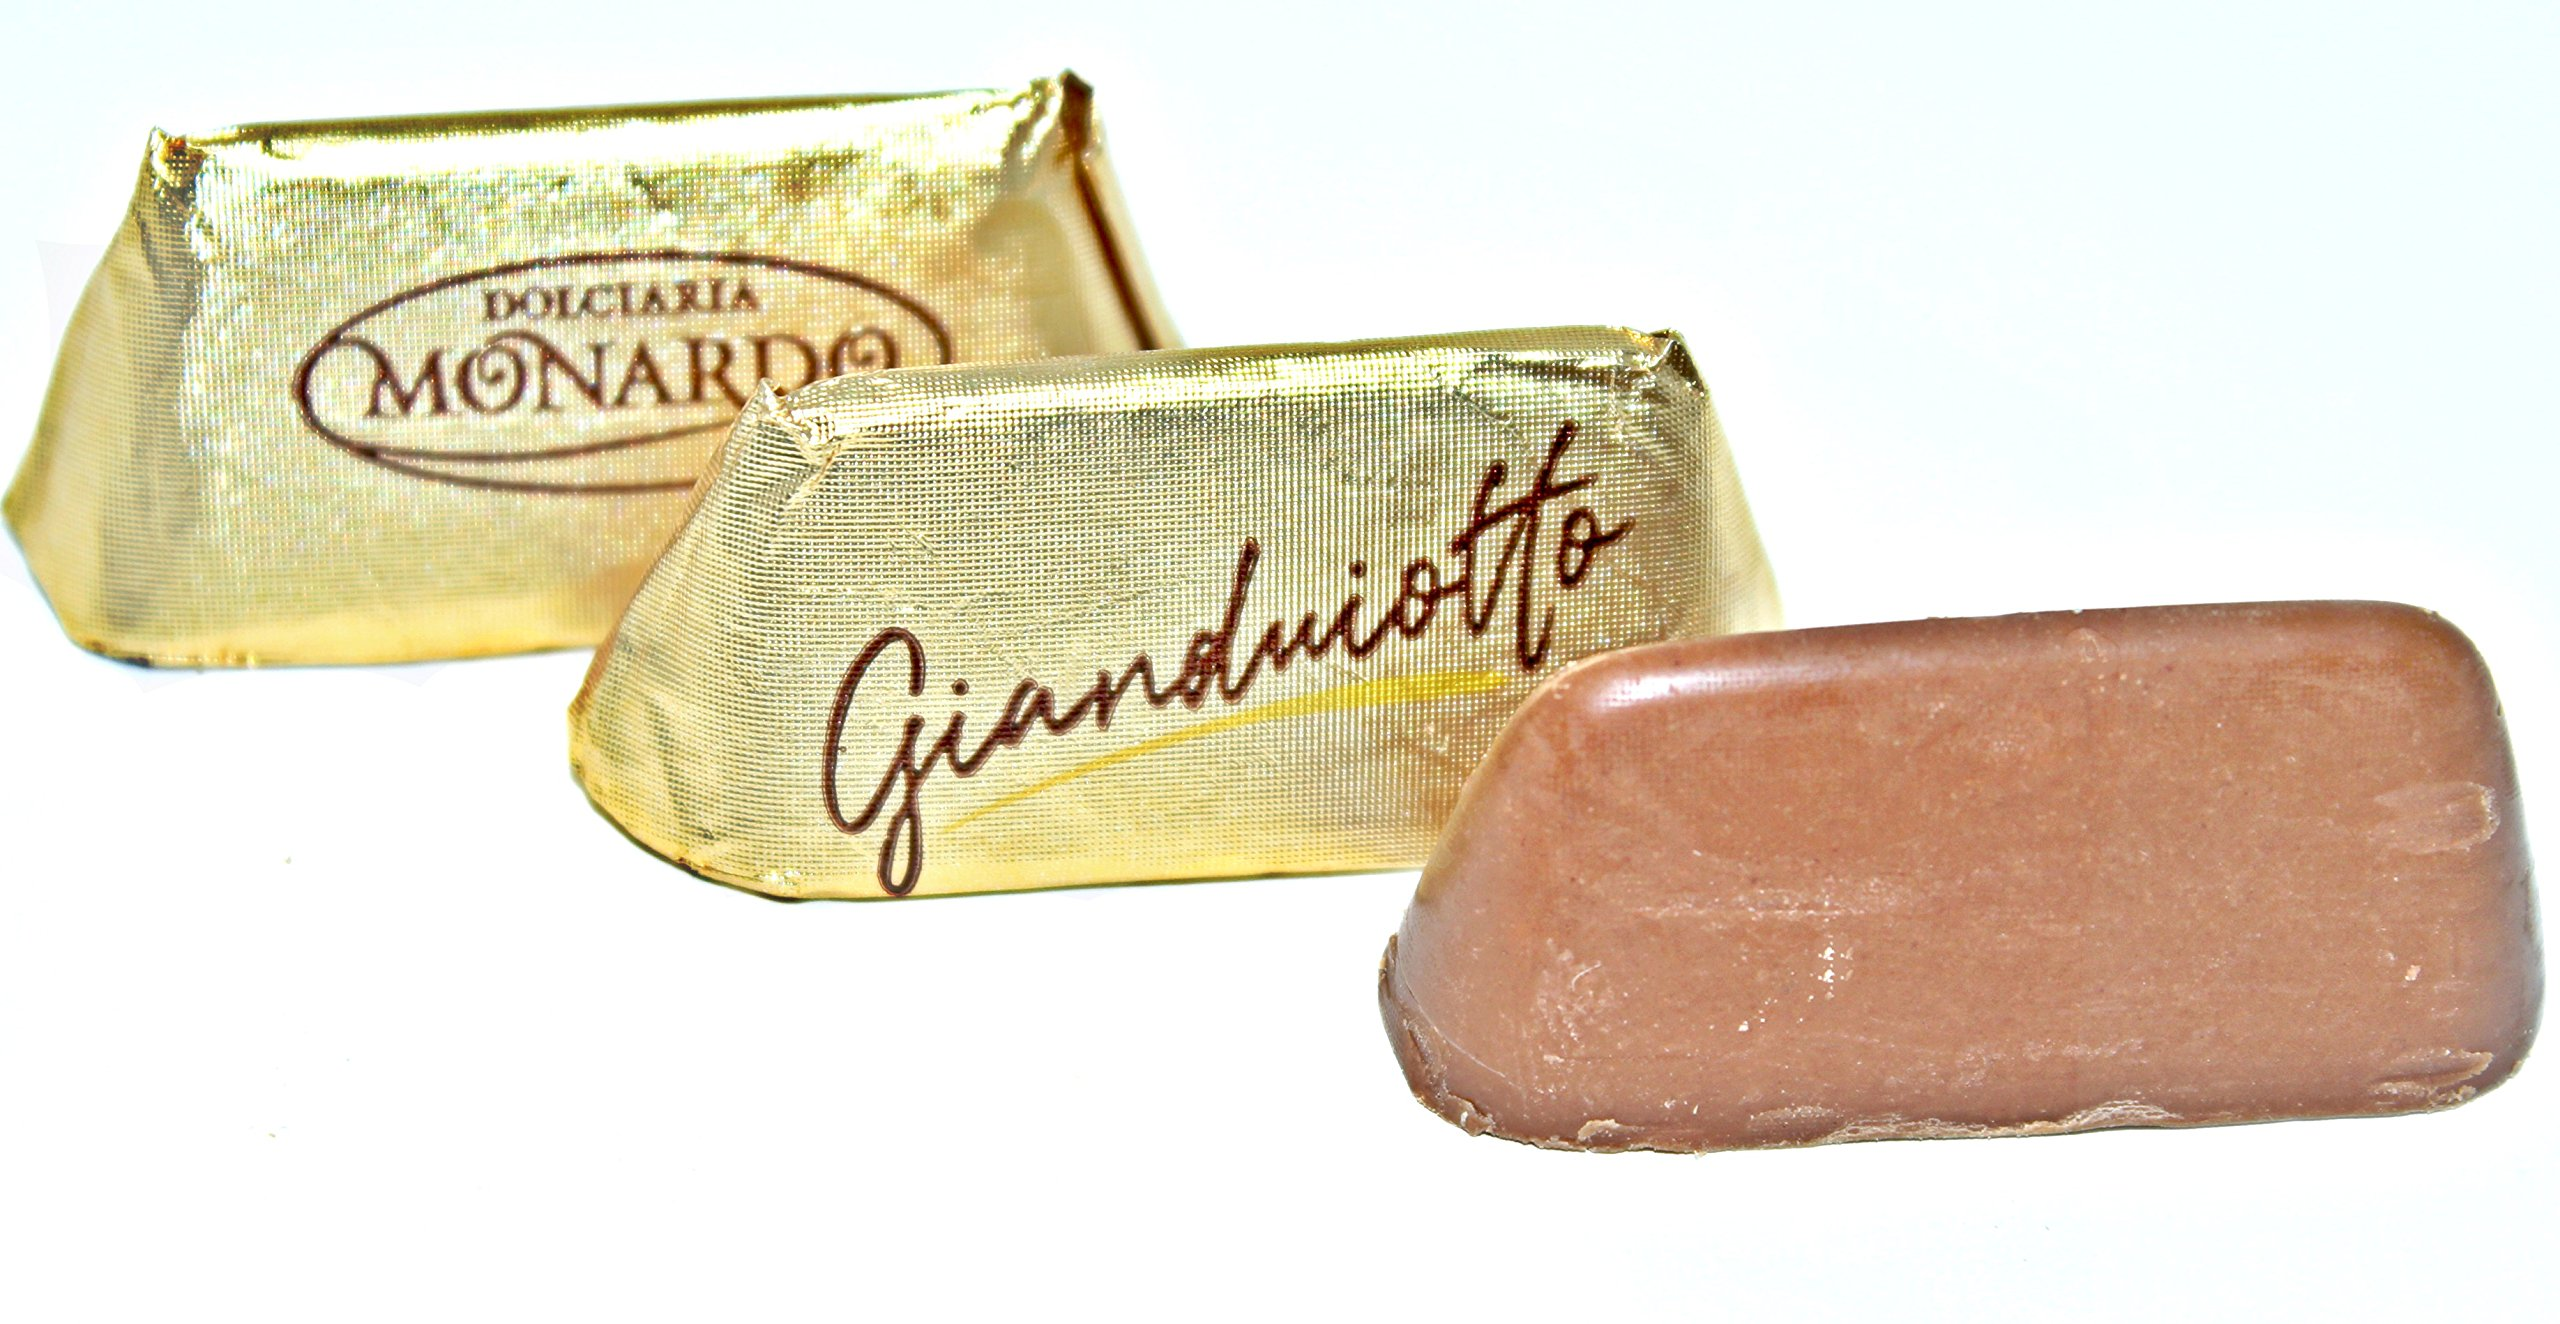 Monardo, Italian Gold Gianduiotto Smooth Blend of Milk Chocolate w/ Rst Hazelnut Butter (Gianduia) (50 pcs) by Monardo